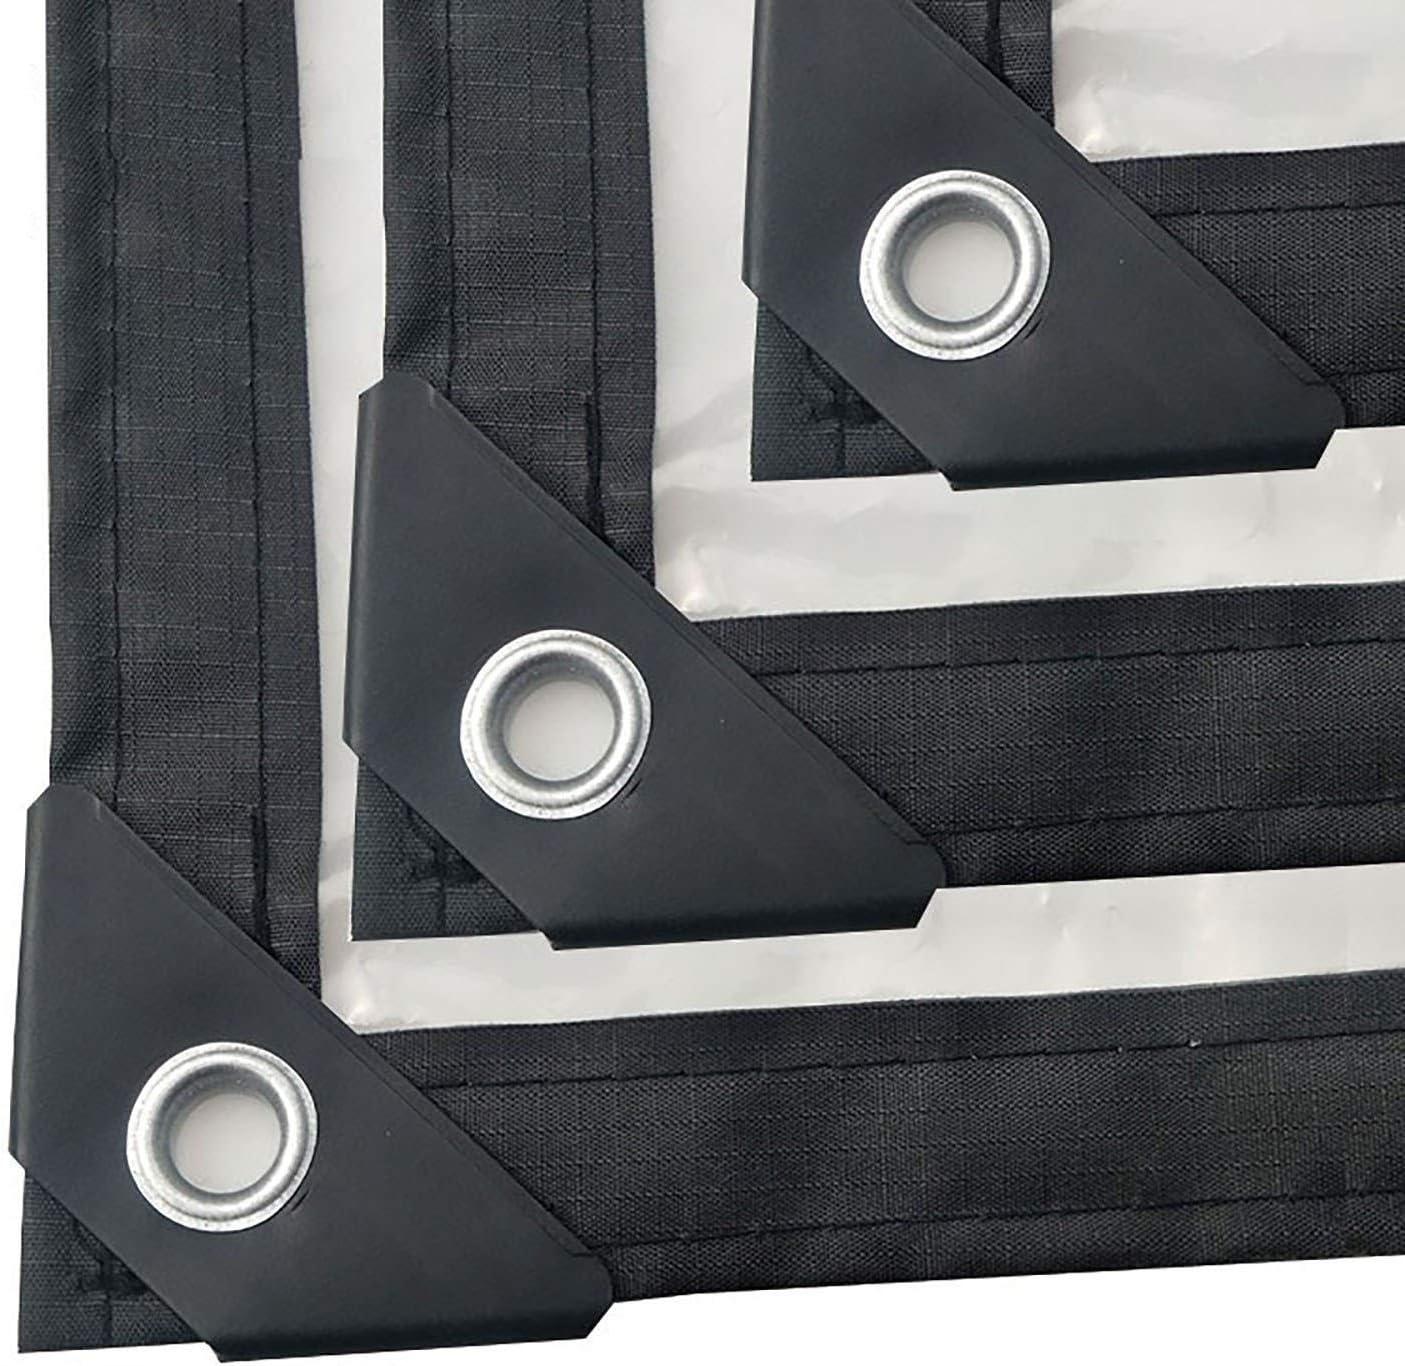 ANUO Lonas Lona Transparente Transparente Lona, PE Pérgola Pabellón Cubierta de Lona de Malla Sol Bordes Reforzados Reversible al Aire Libre (Color : Clear, Size : 2x2m/6x6ft): Amazon.es: Hogar